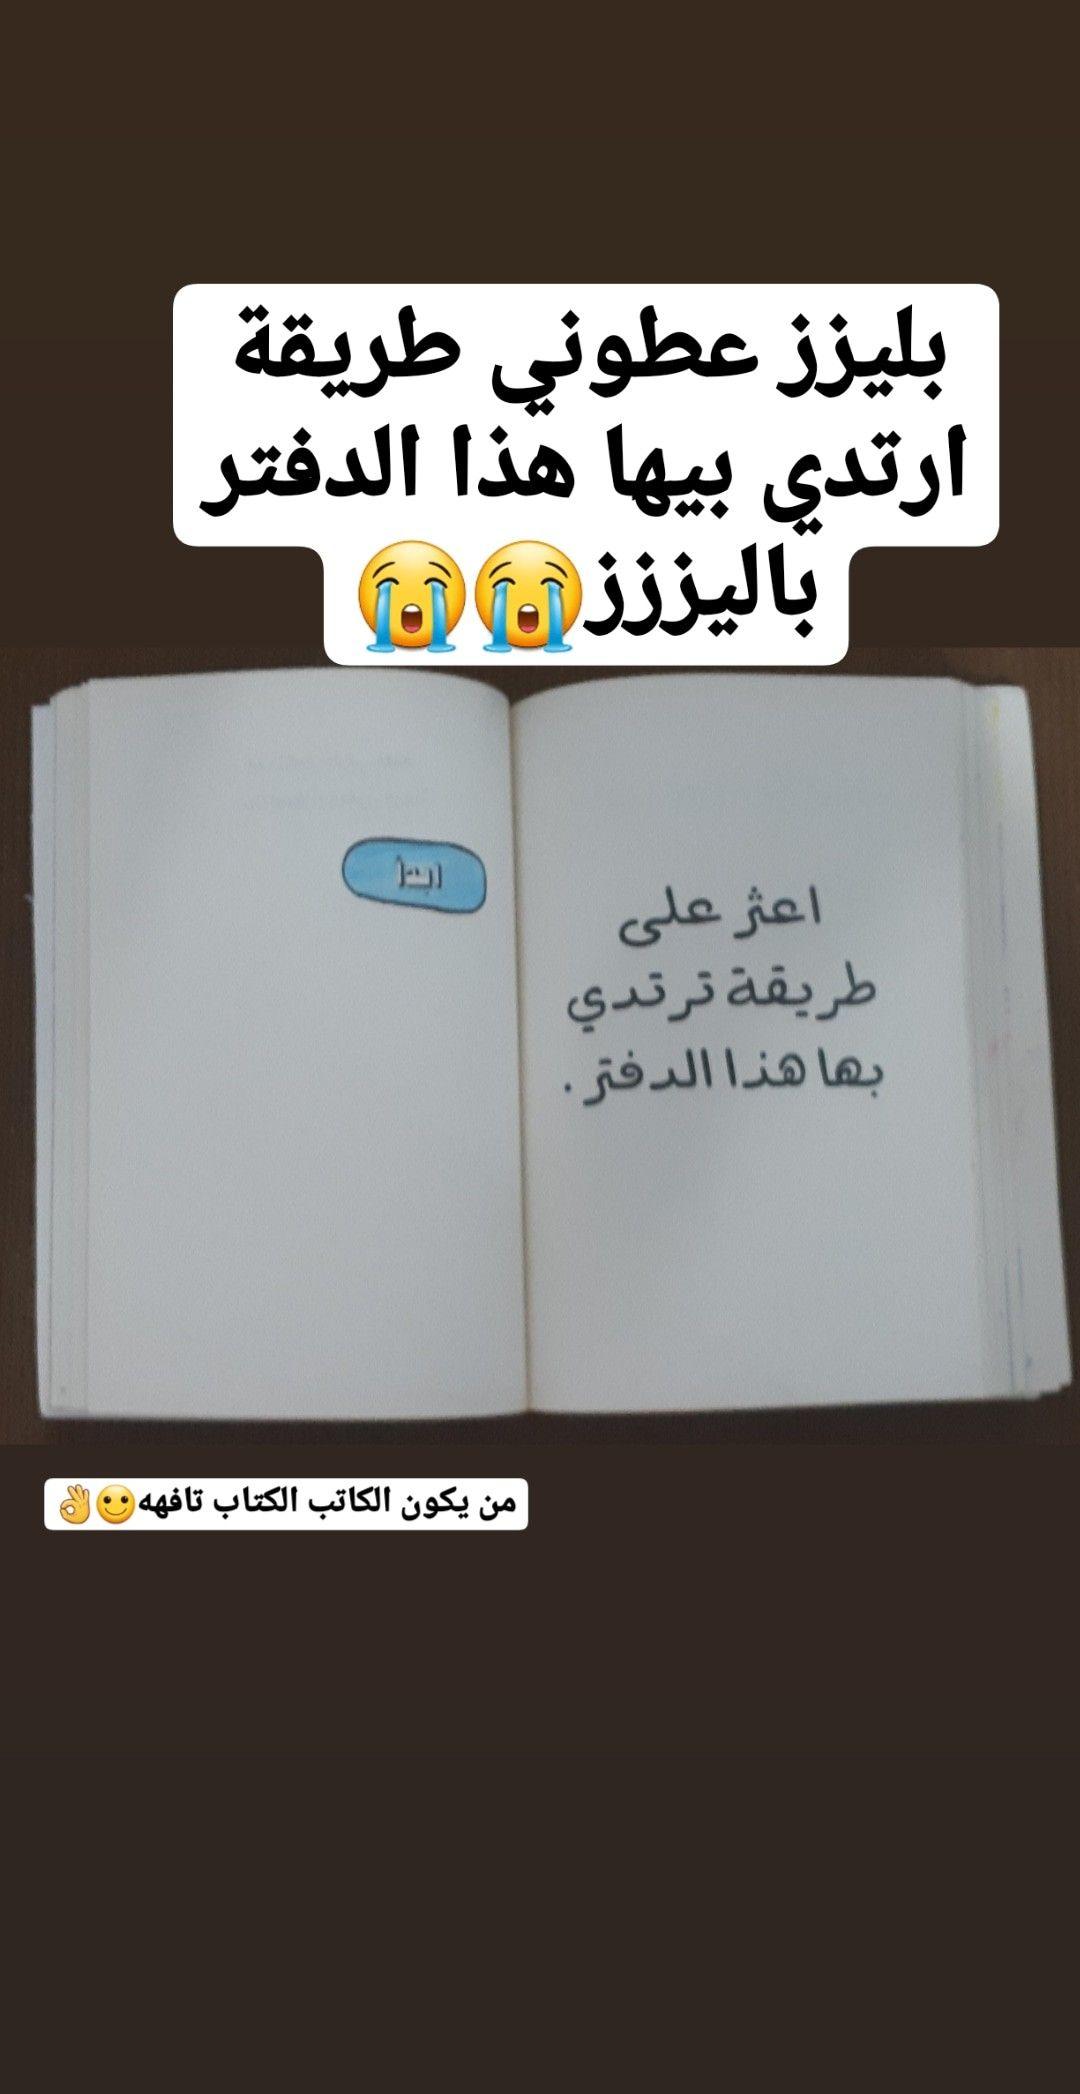 من اتلف دفتر اليوميات هذا Funny Art Quran Quotes Cards Against Humanity